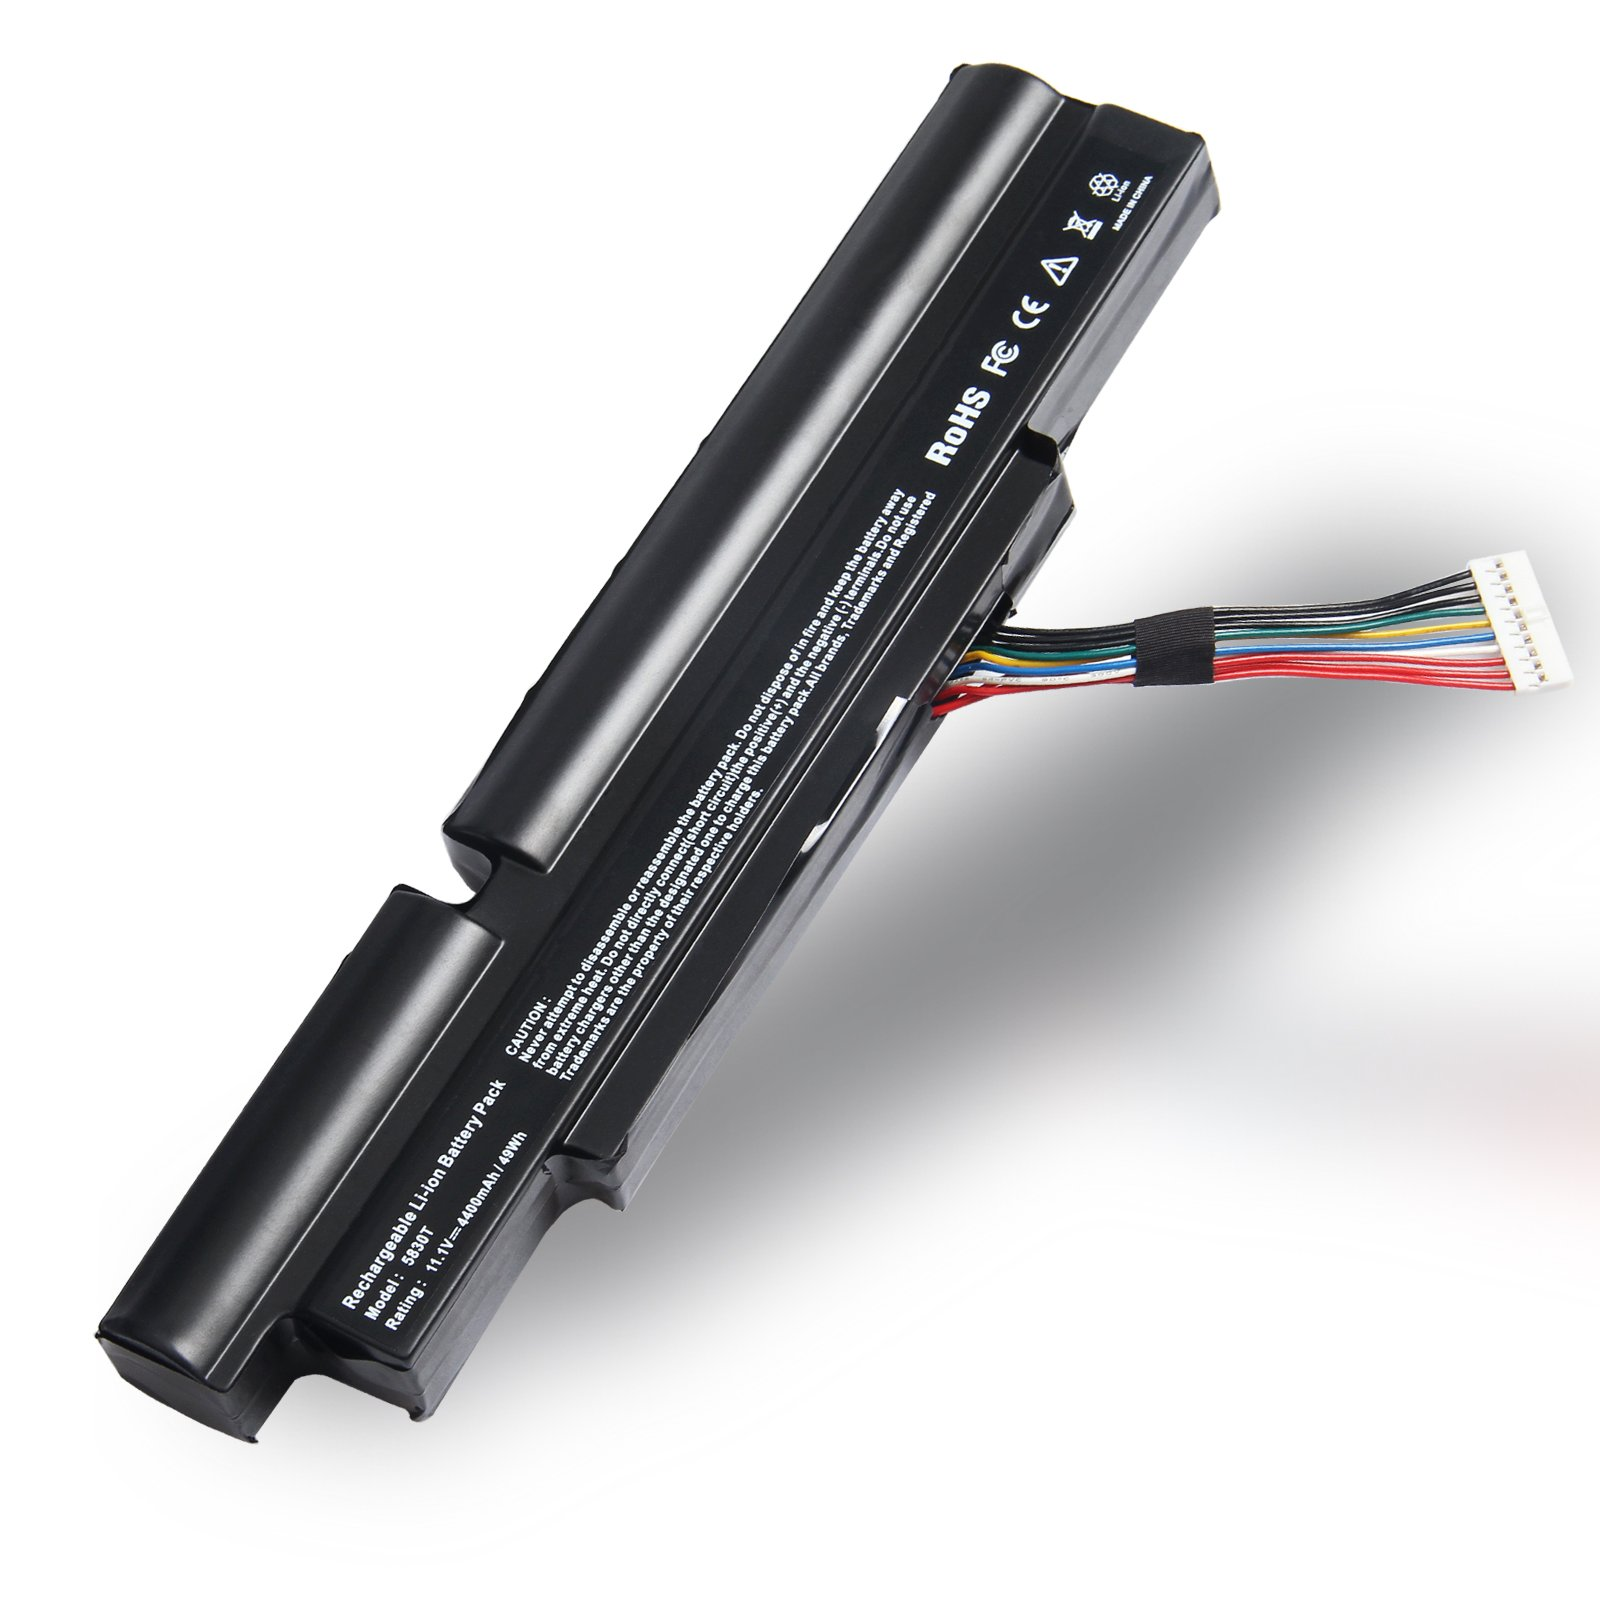 Fancy Buying 3ICR19/66-2 AS11A3E AS11A5E AS11B5E High Power Laptop Notebook Battery for ACER Aspire TimelineX 4830T-2413G25Mn 4830T-6642 4830TG [6 Cells 11.1V 4400mAh]